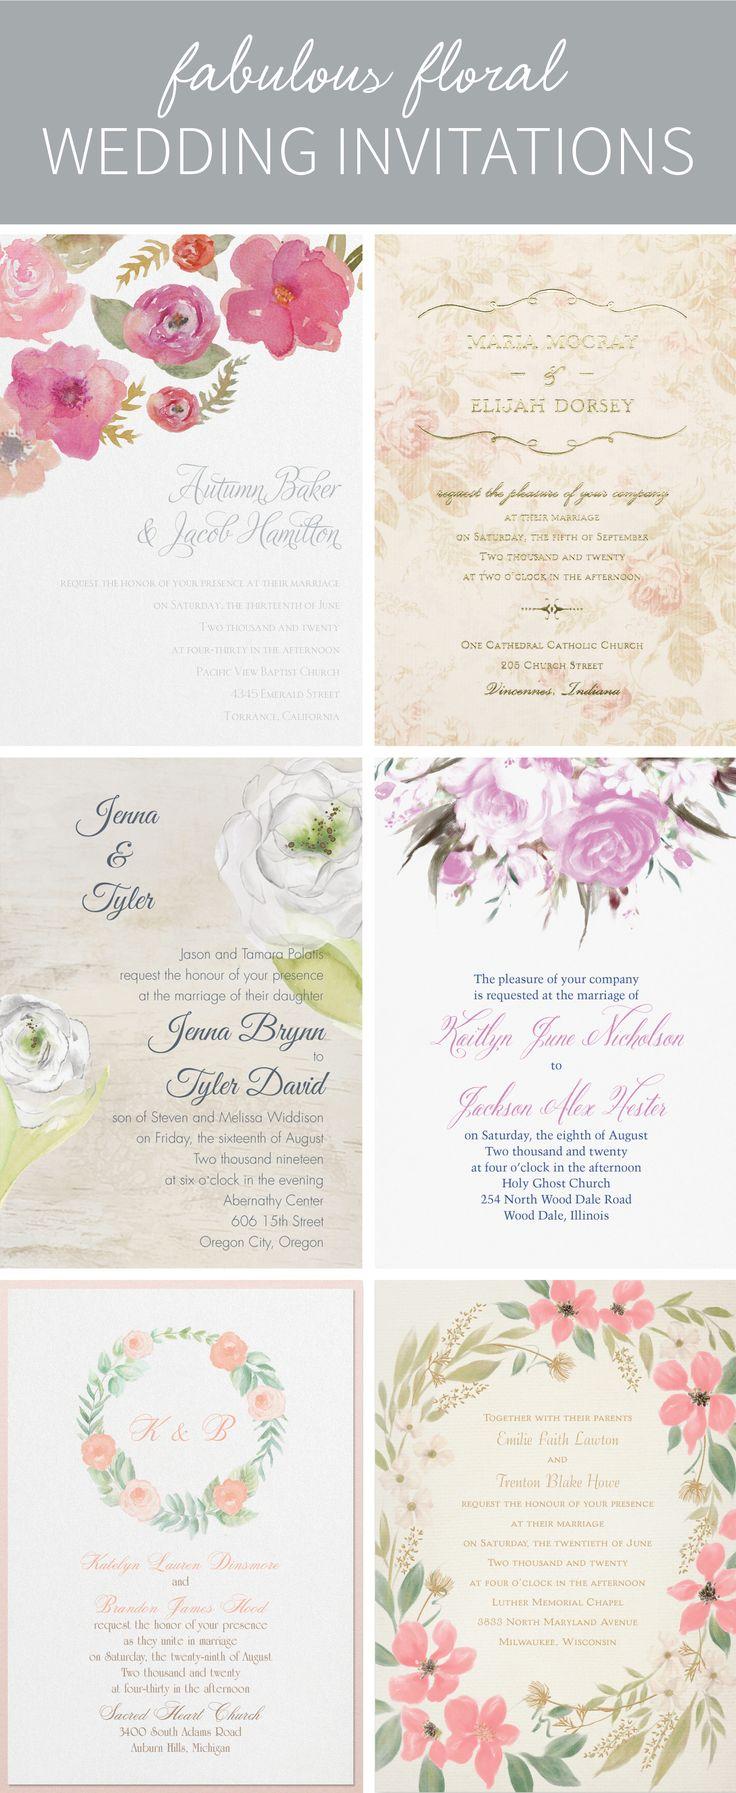 57 Best Watercolor Wedding Images On Pinterest Watercolor Wedding